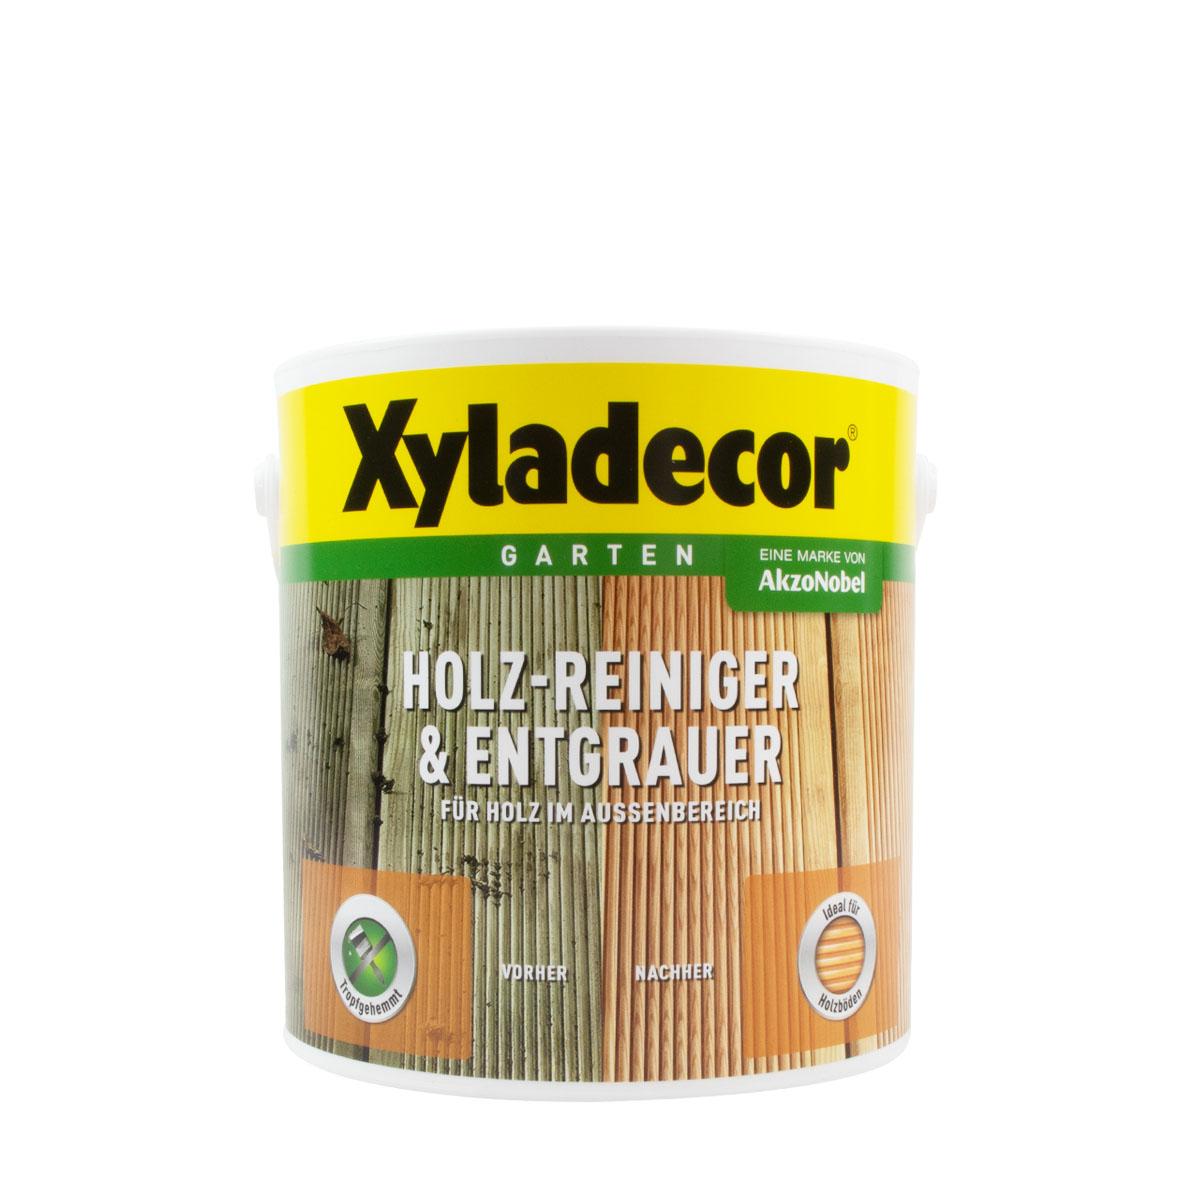 Xyladecor Holz-Reiniger & Entgrauer 2,5L